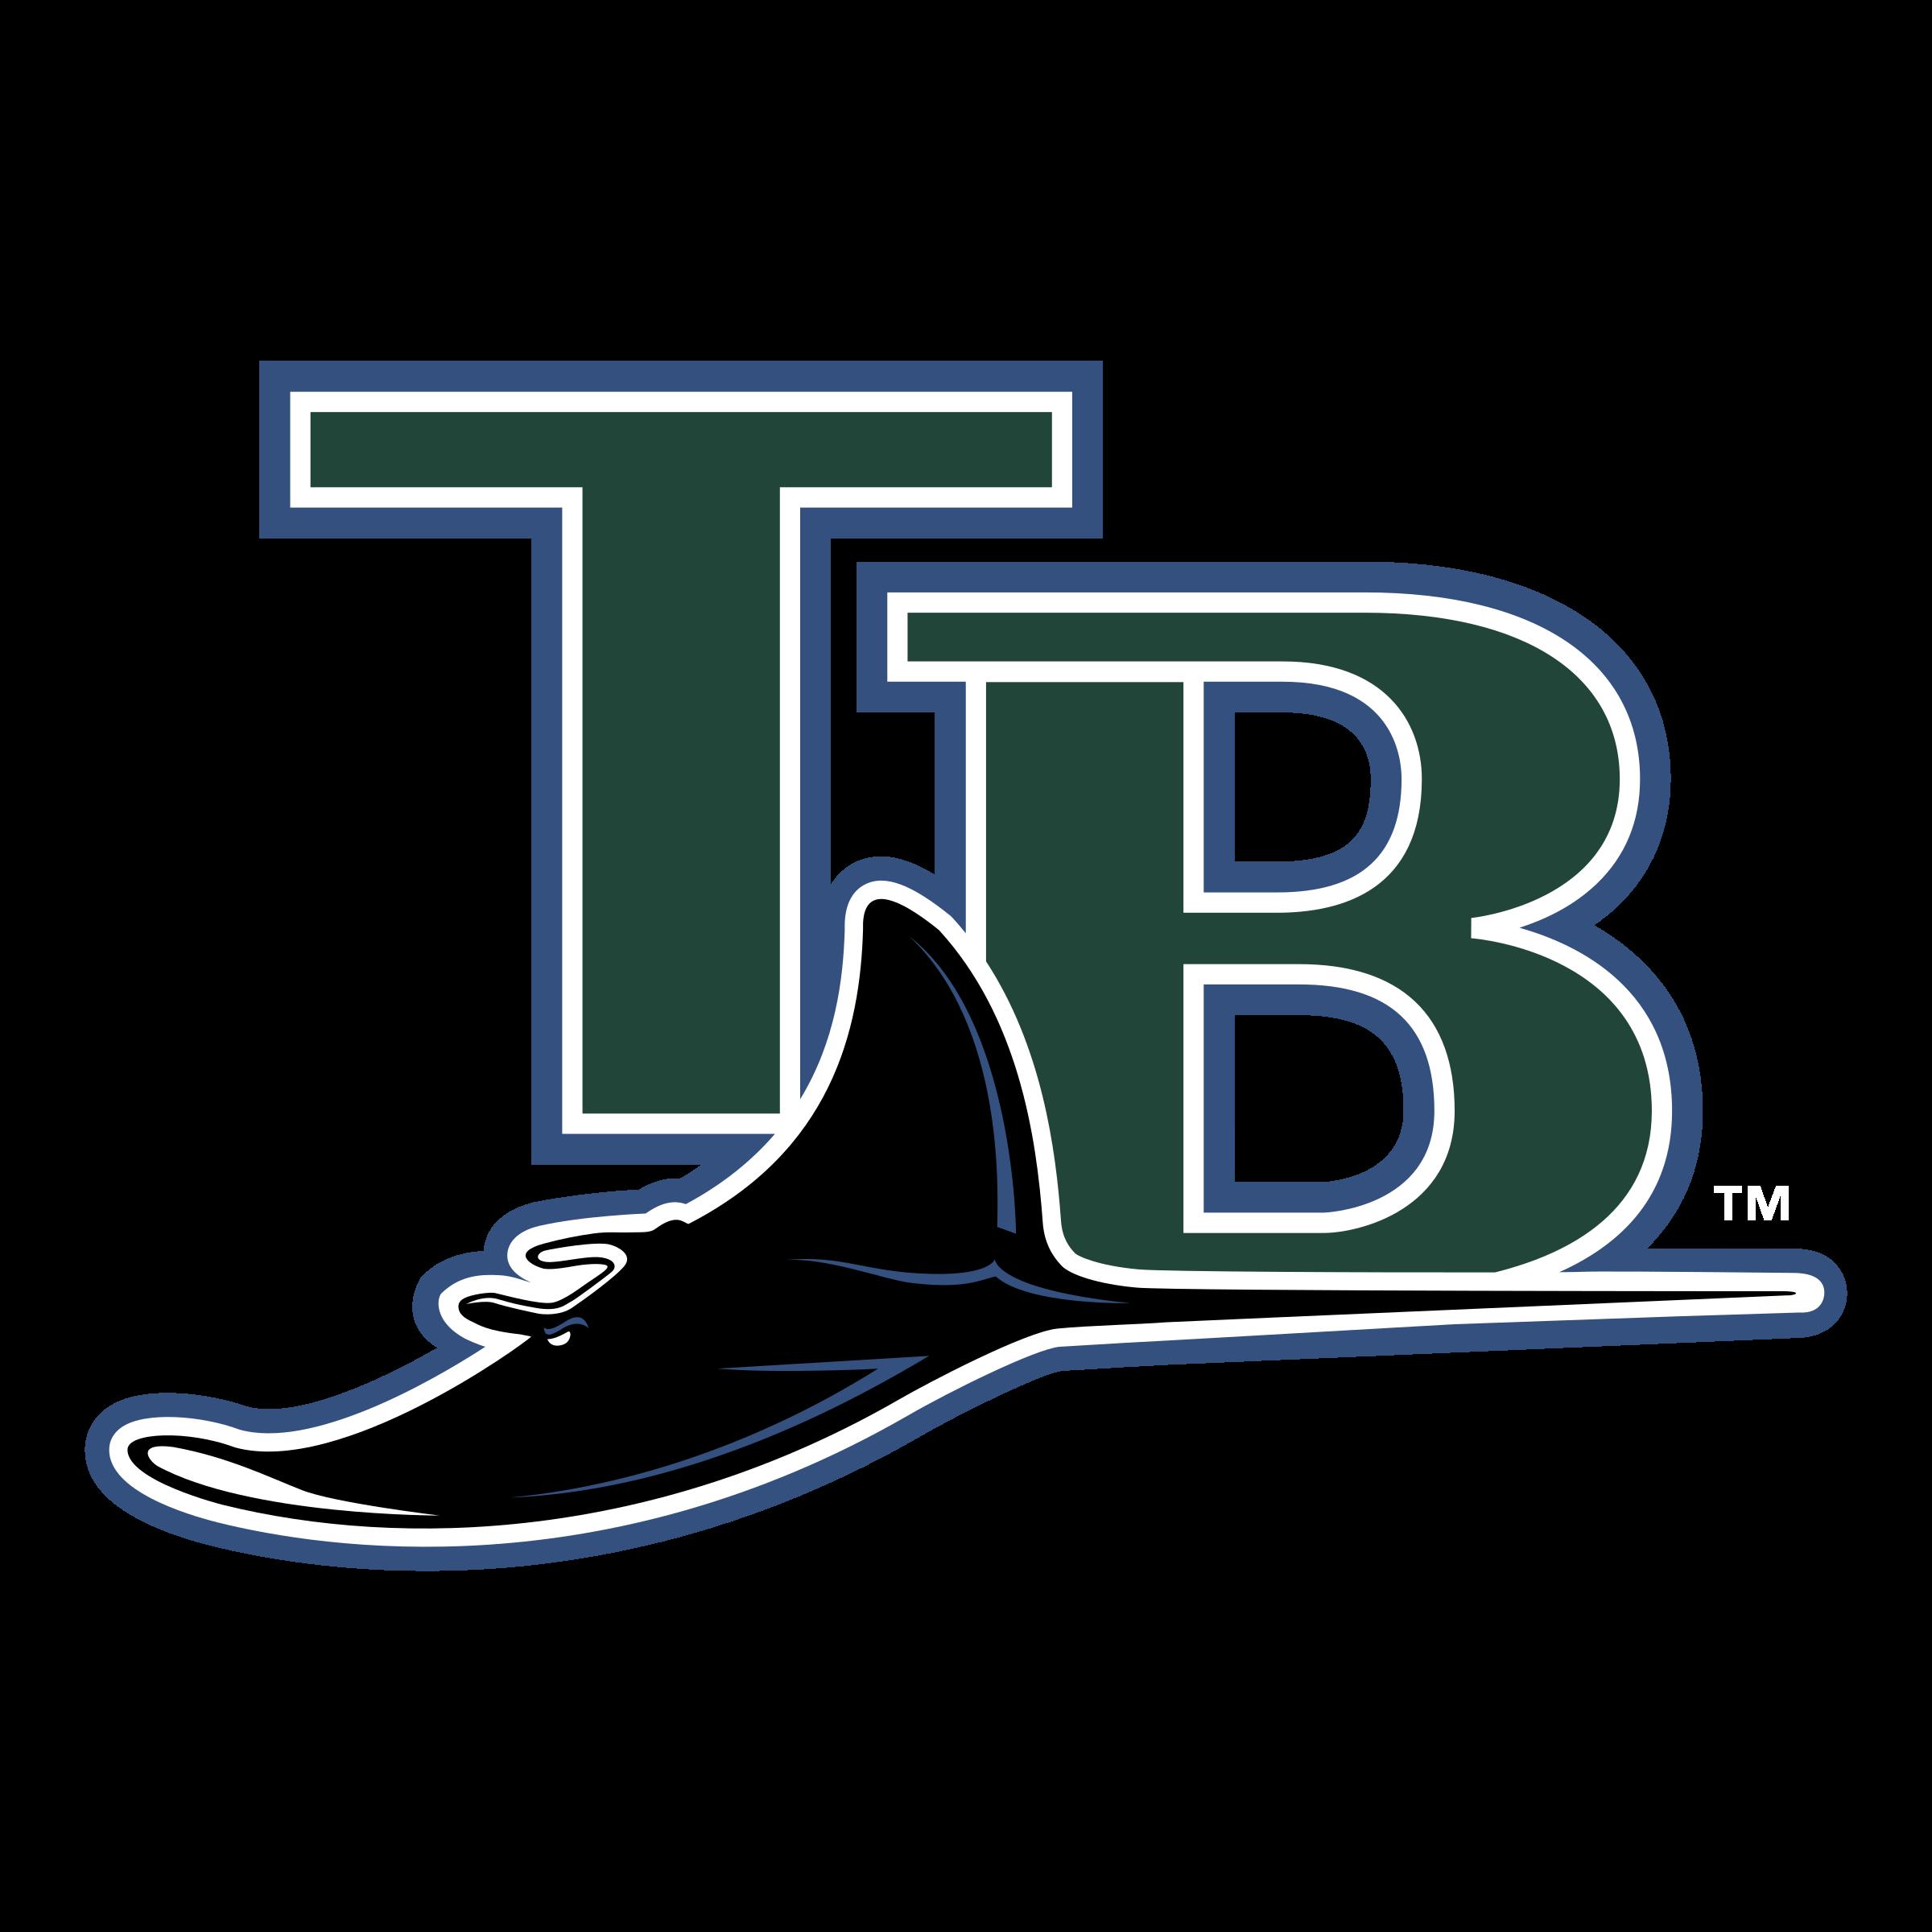 Tampa Bay Devil Rays Logo PNG Transparent